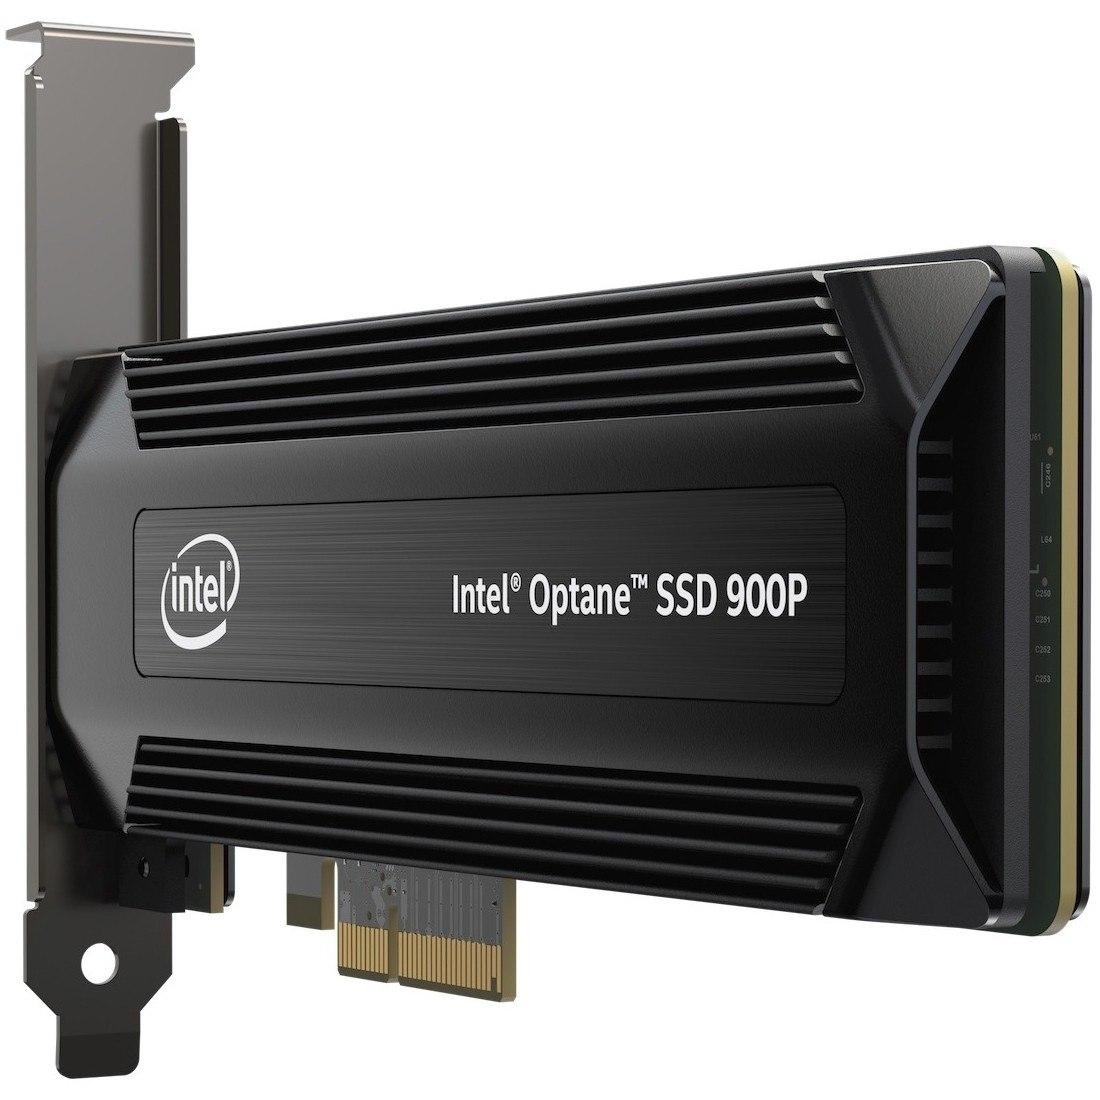 Intel Optane 900P 480 GB Solid State Drive - PCI Express (PCI Express 3.0 x4) - Internal - Plug-in Card